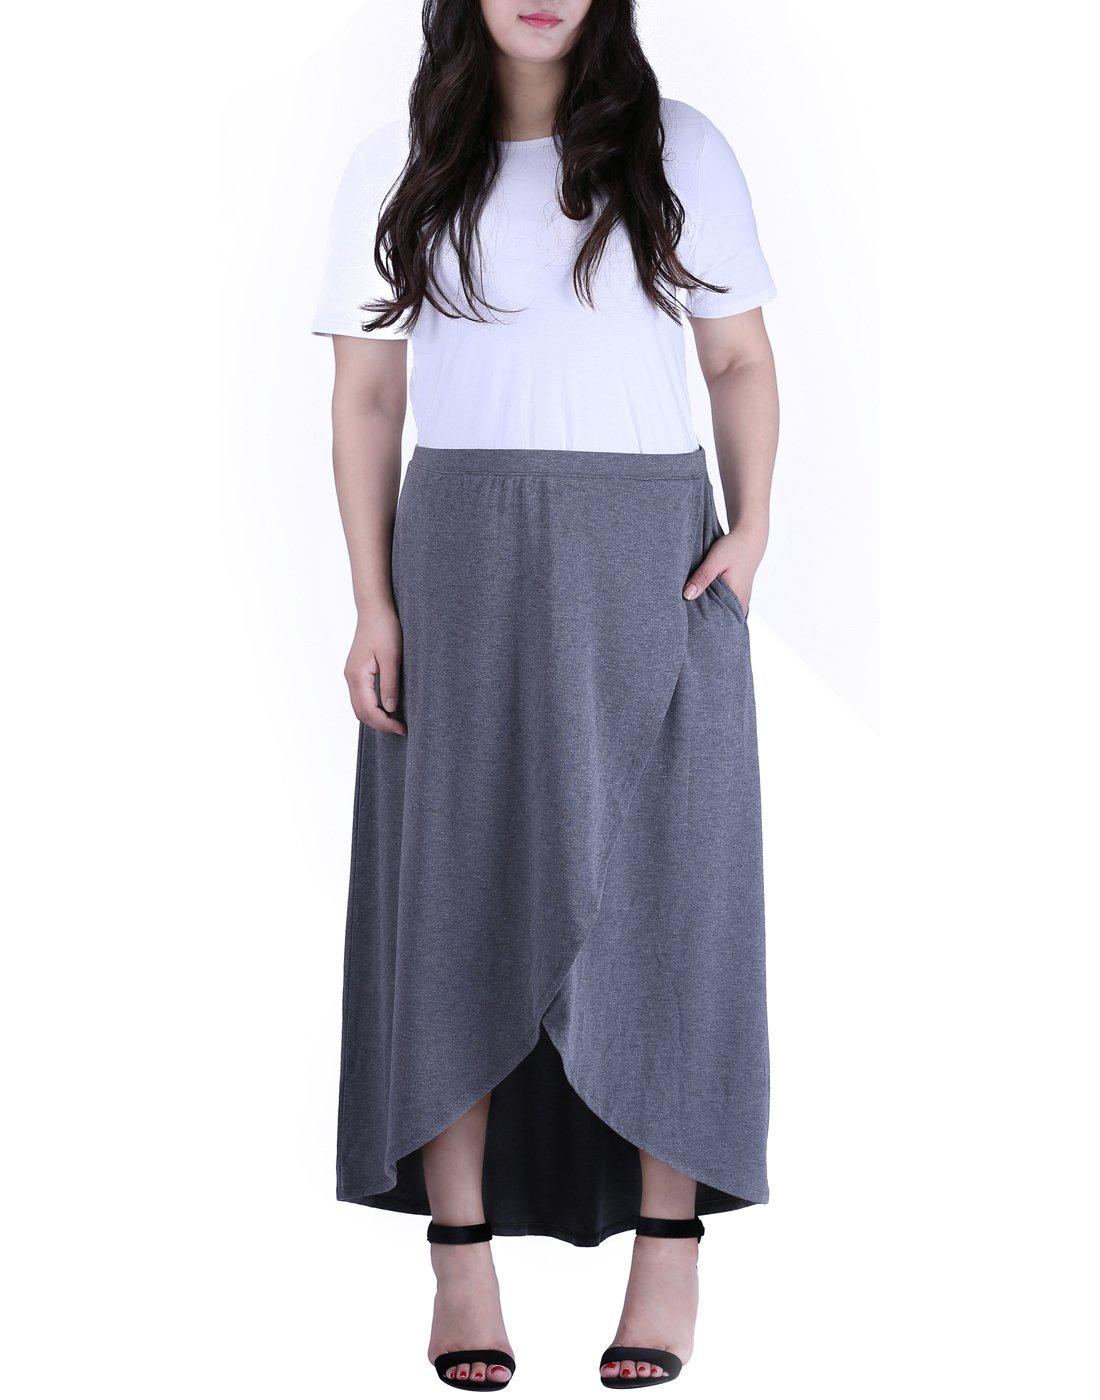 HDE Women's Plus Size Lightweight Long Maxi Skirt with Pockets